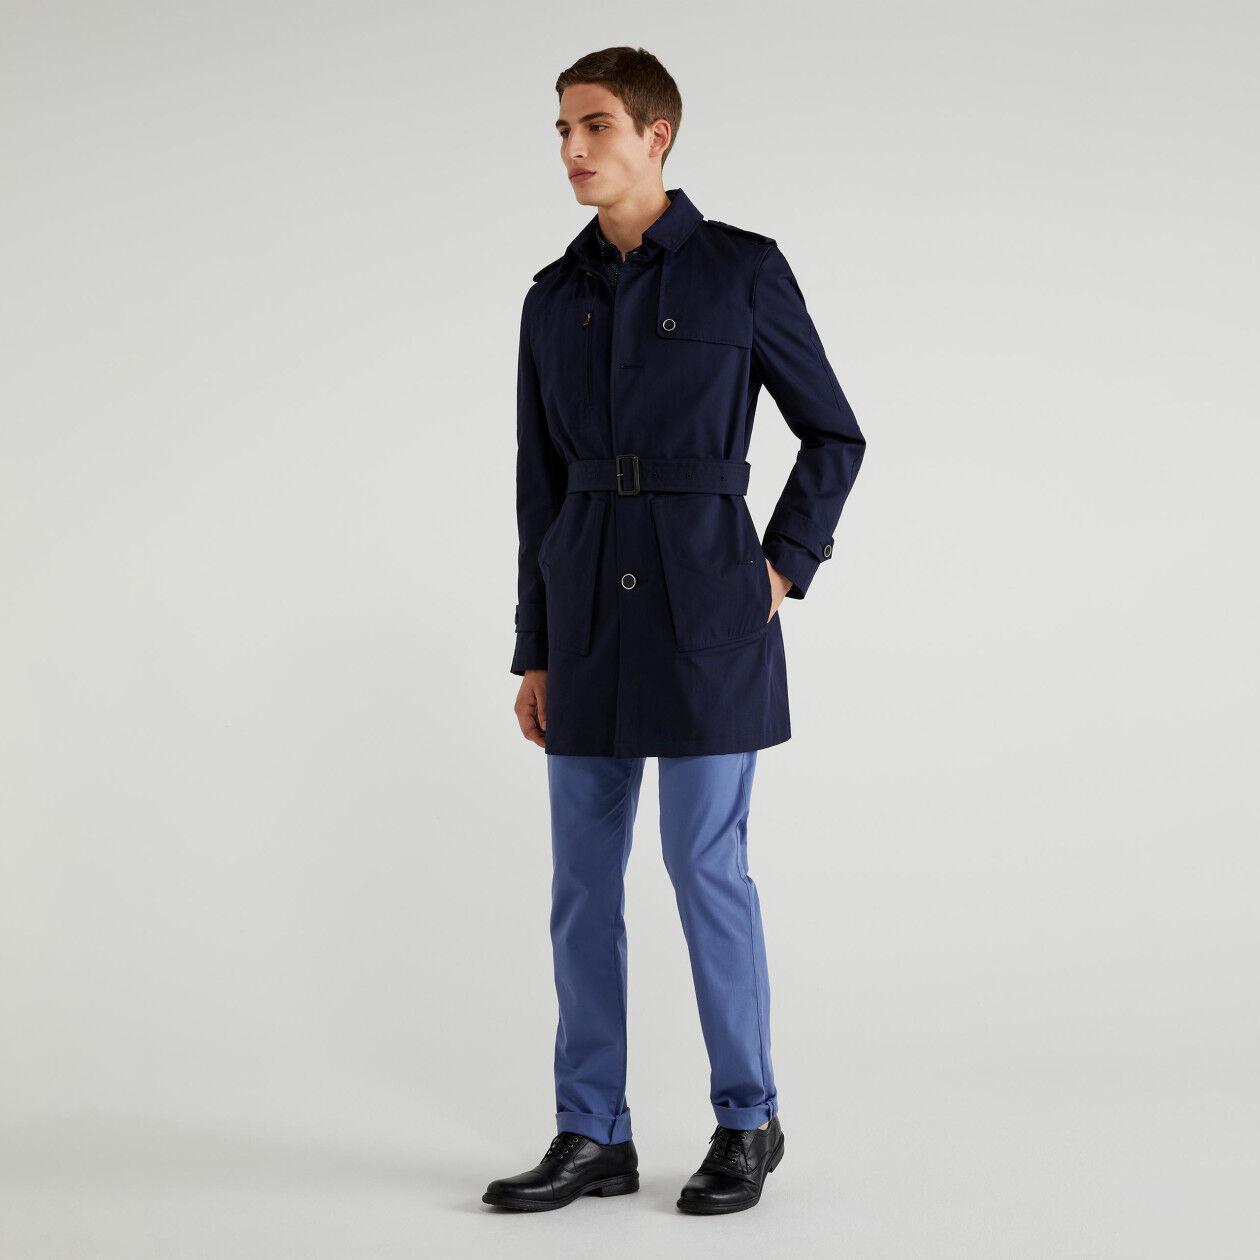 Slim fit trench coat